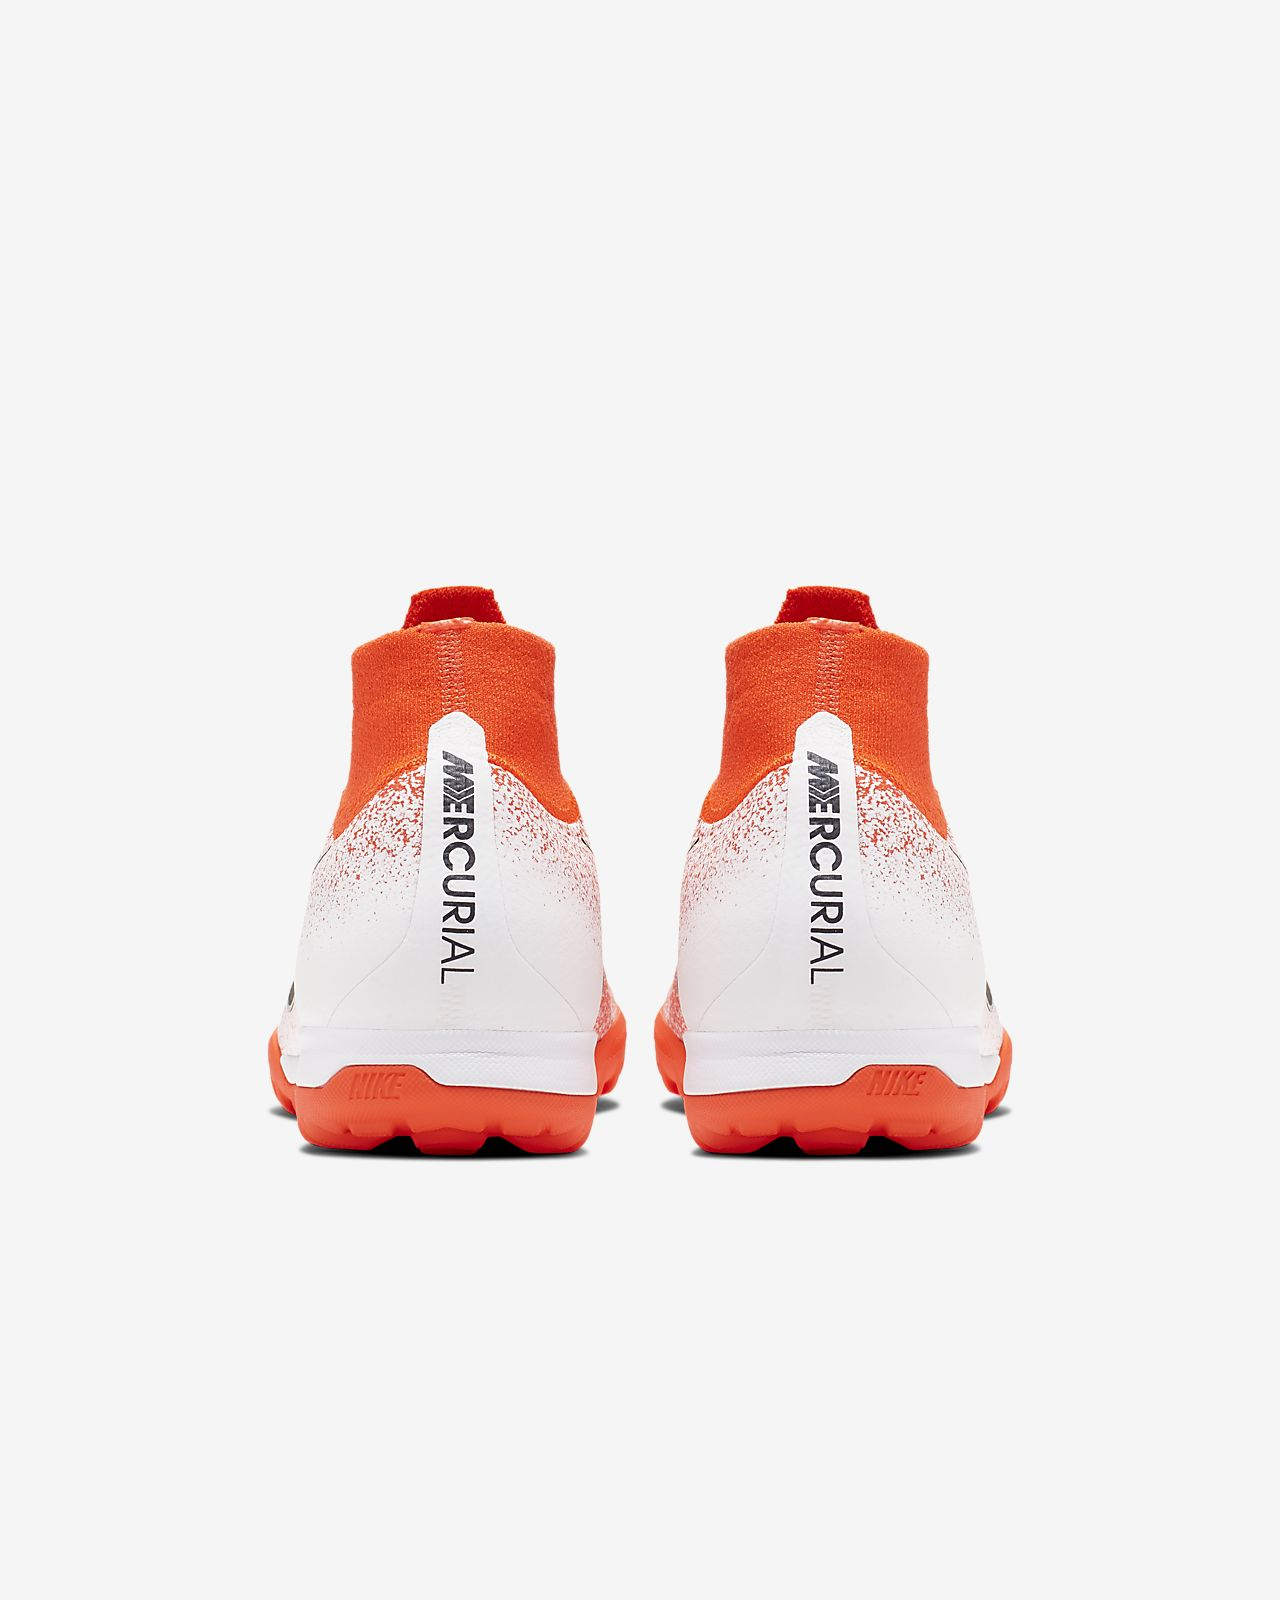 56a6a85147cb Nike SuperflyX 6 Elite TF Artificial-Turf Football Boot. Nike.com CA